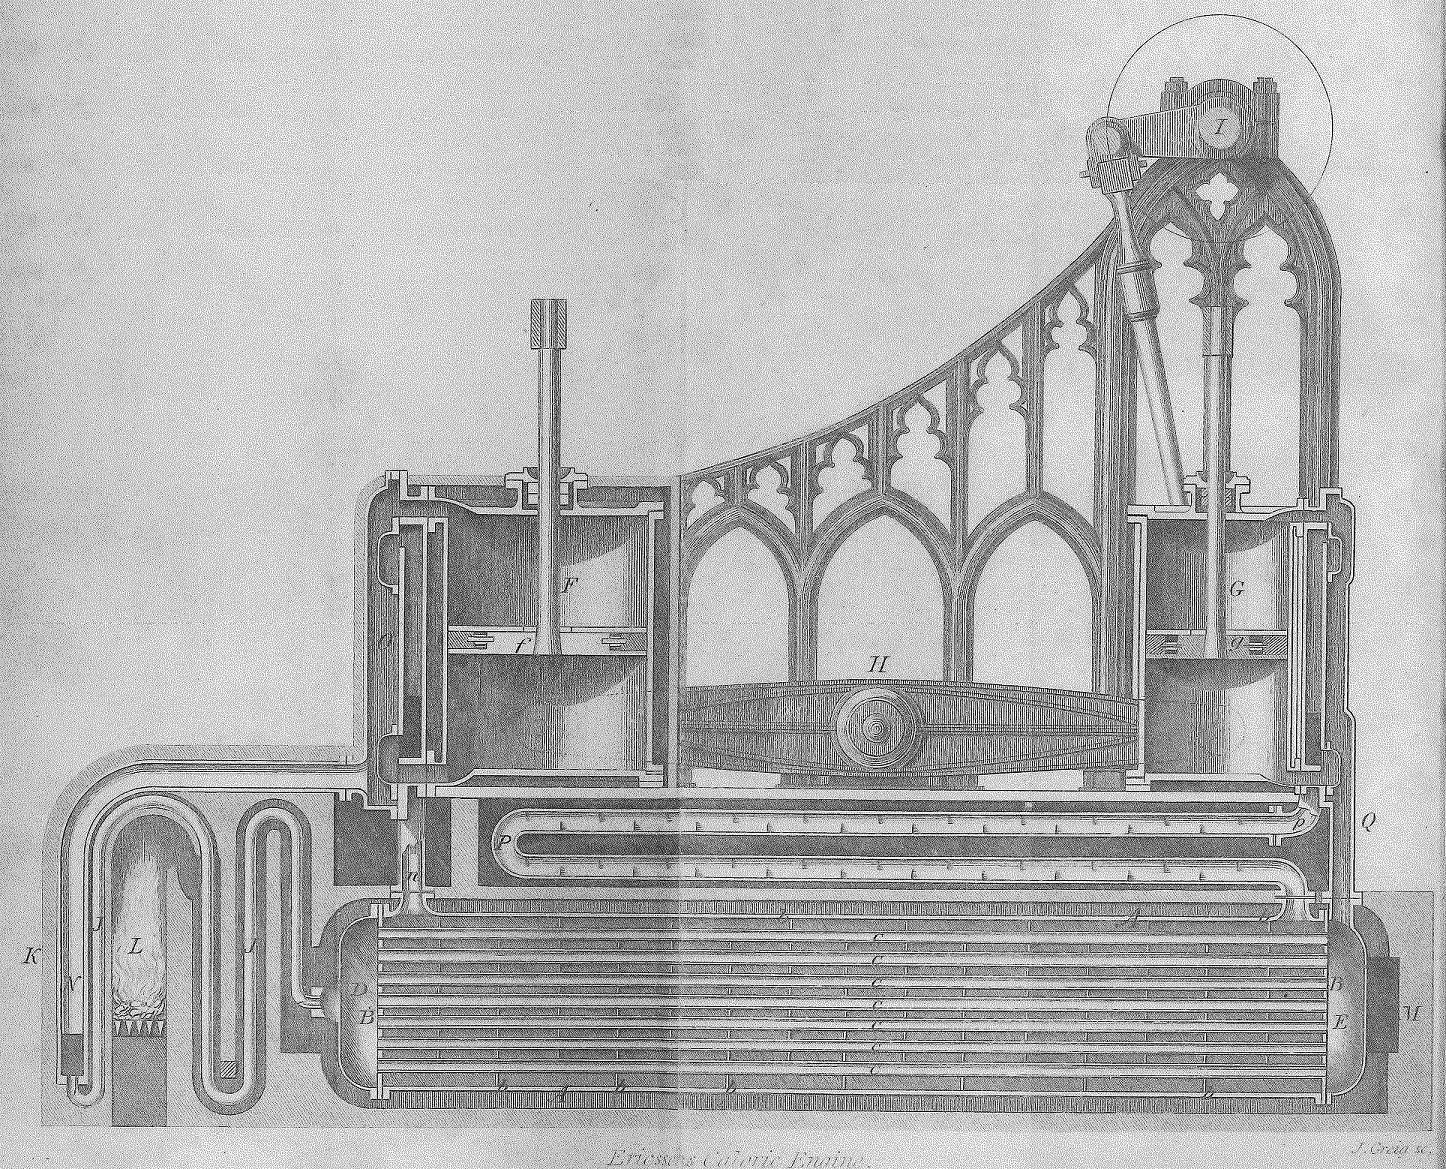 Illustration du livre de Philips, Arts of life